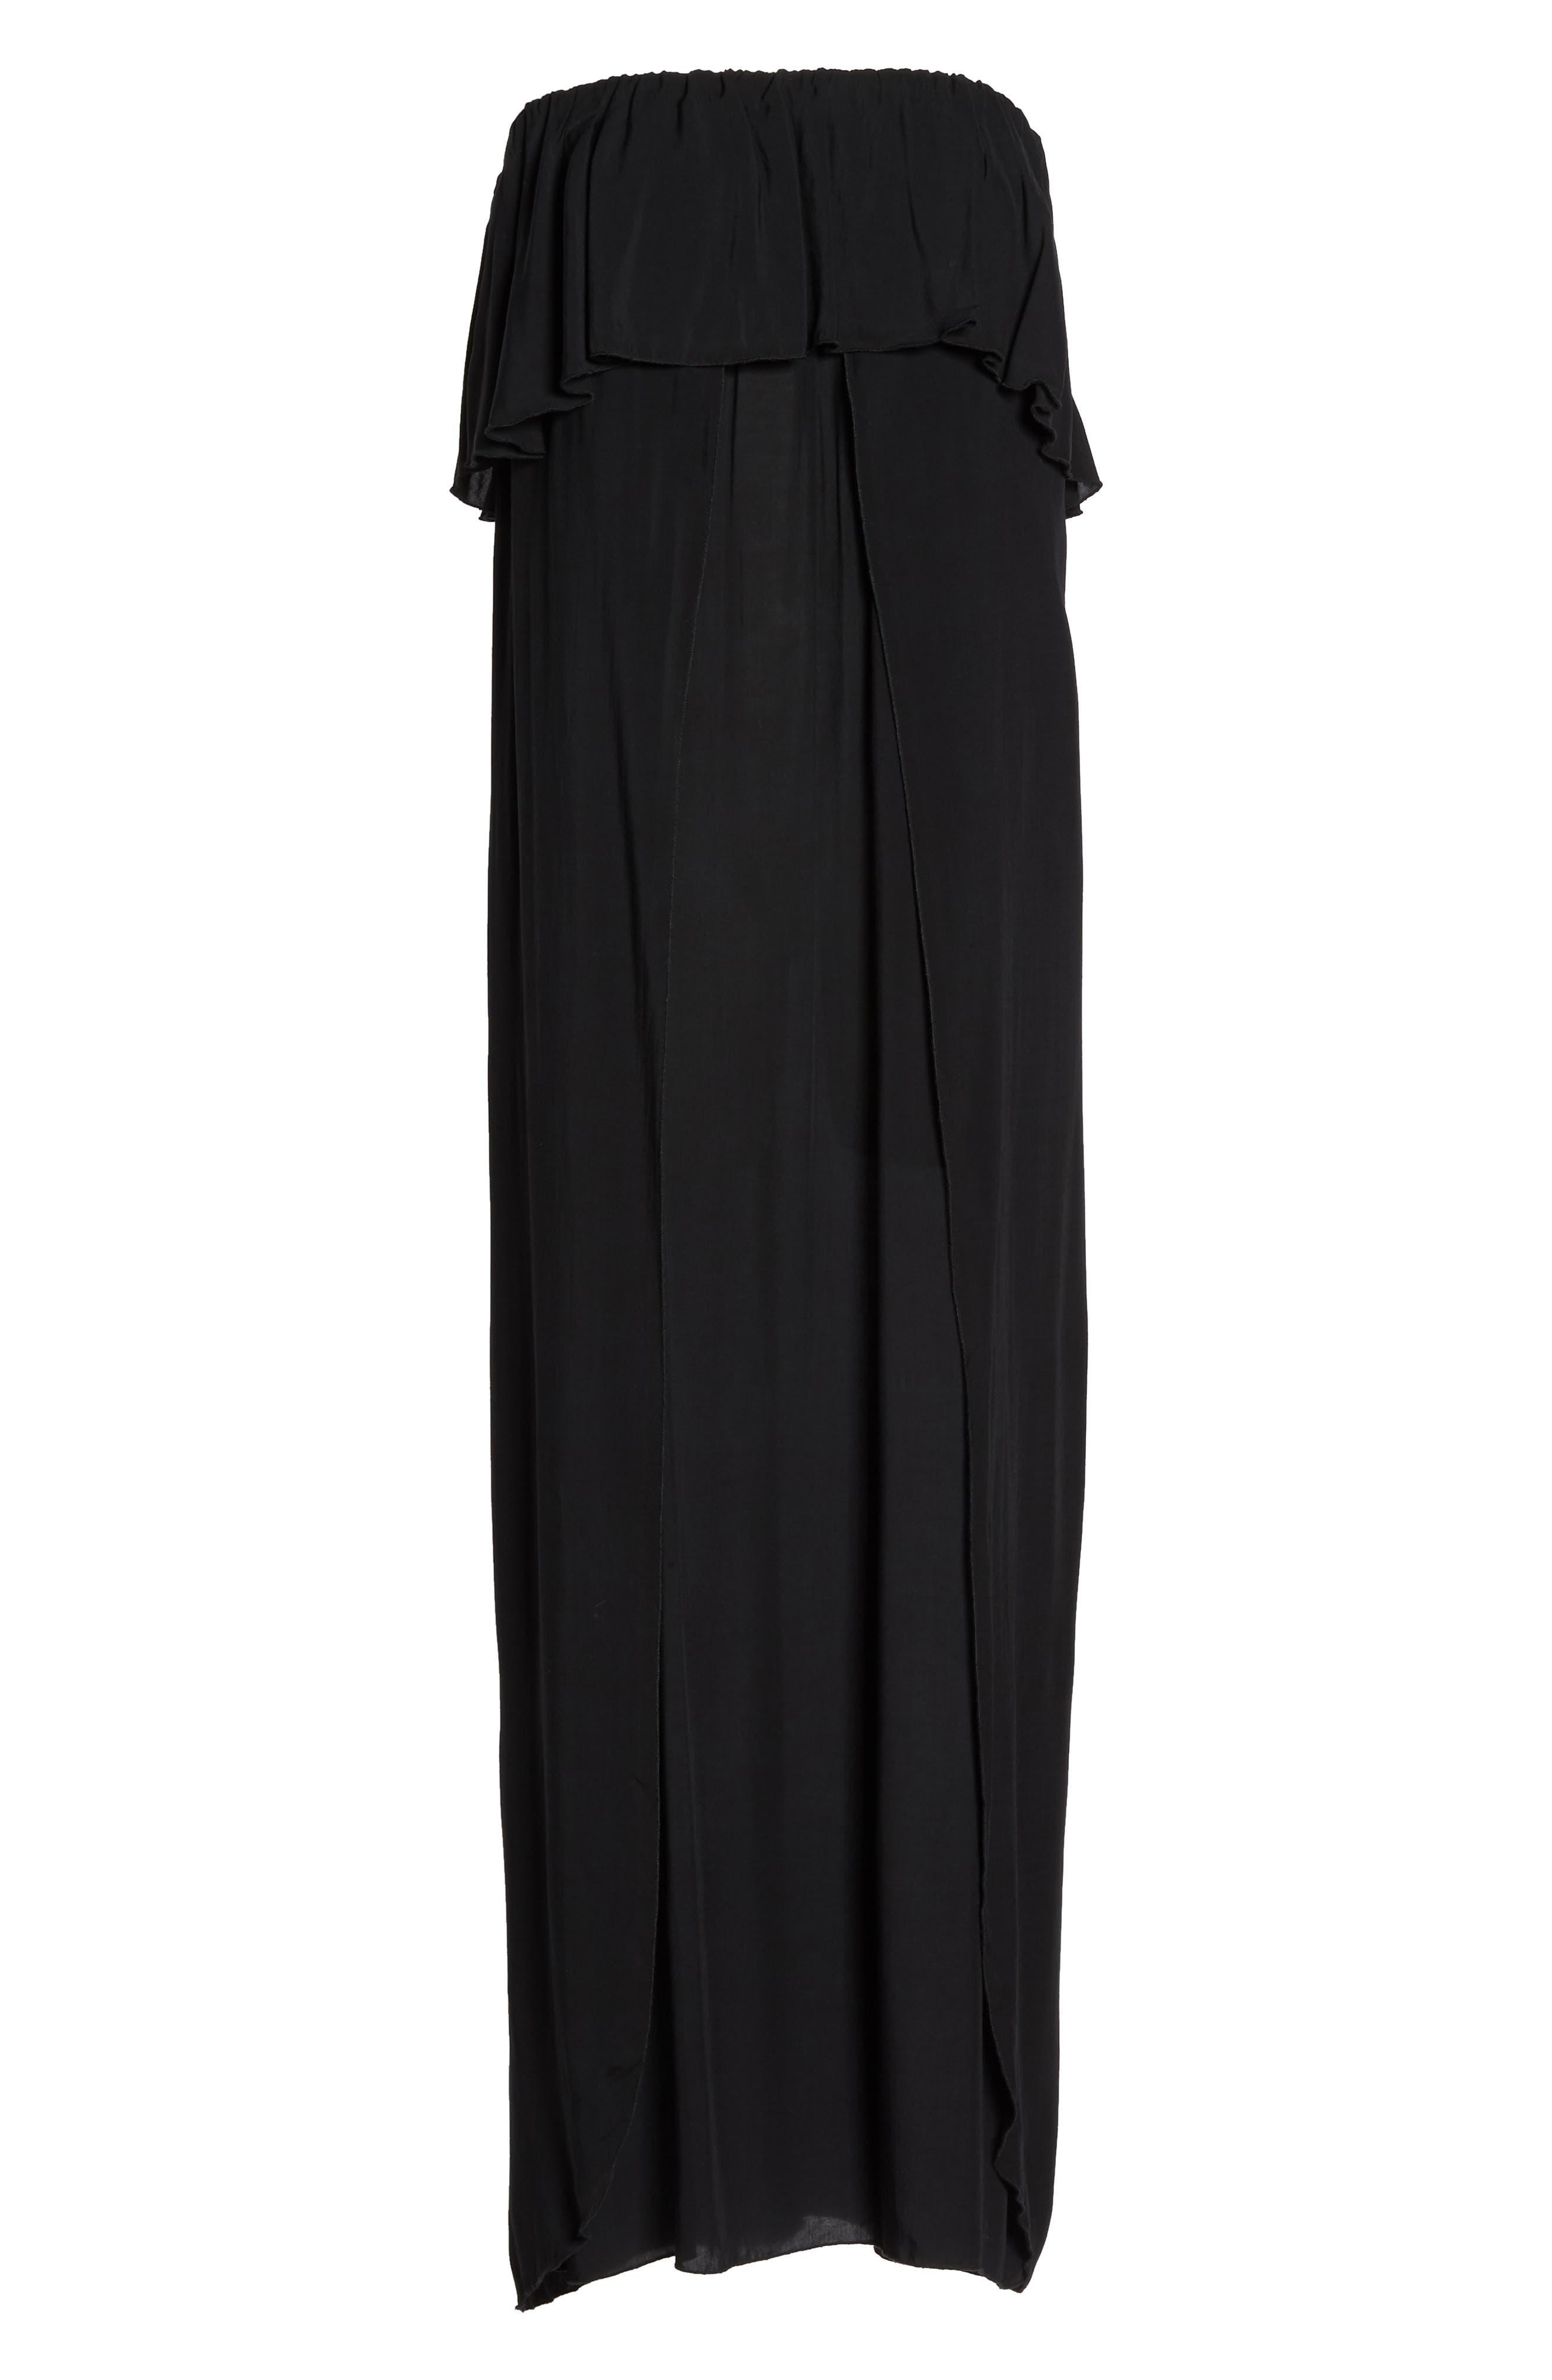 Strapless Maxi Cover-Up Dress,                             Alternate thumbnail 6, color,                             BLACK